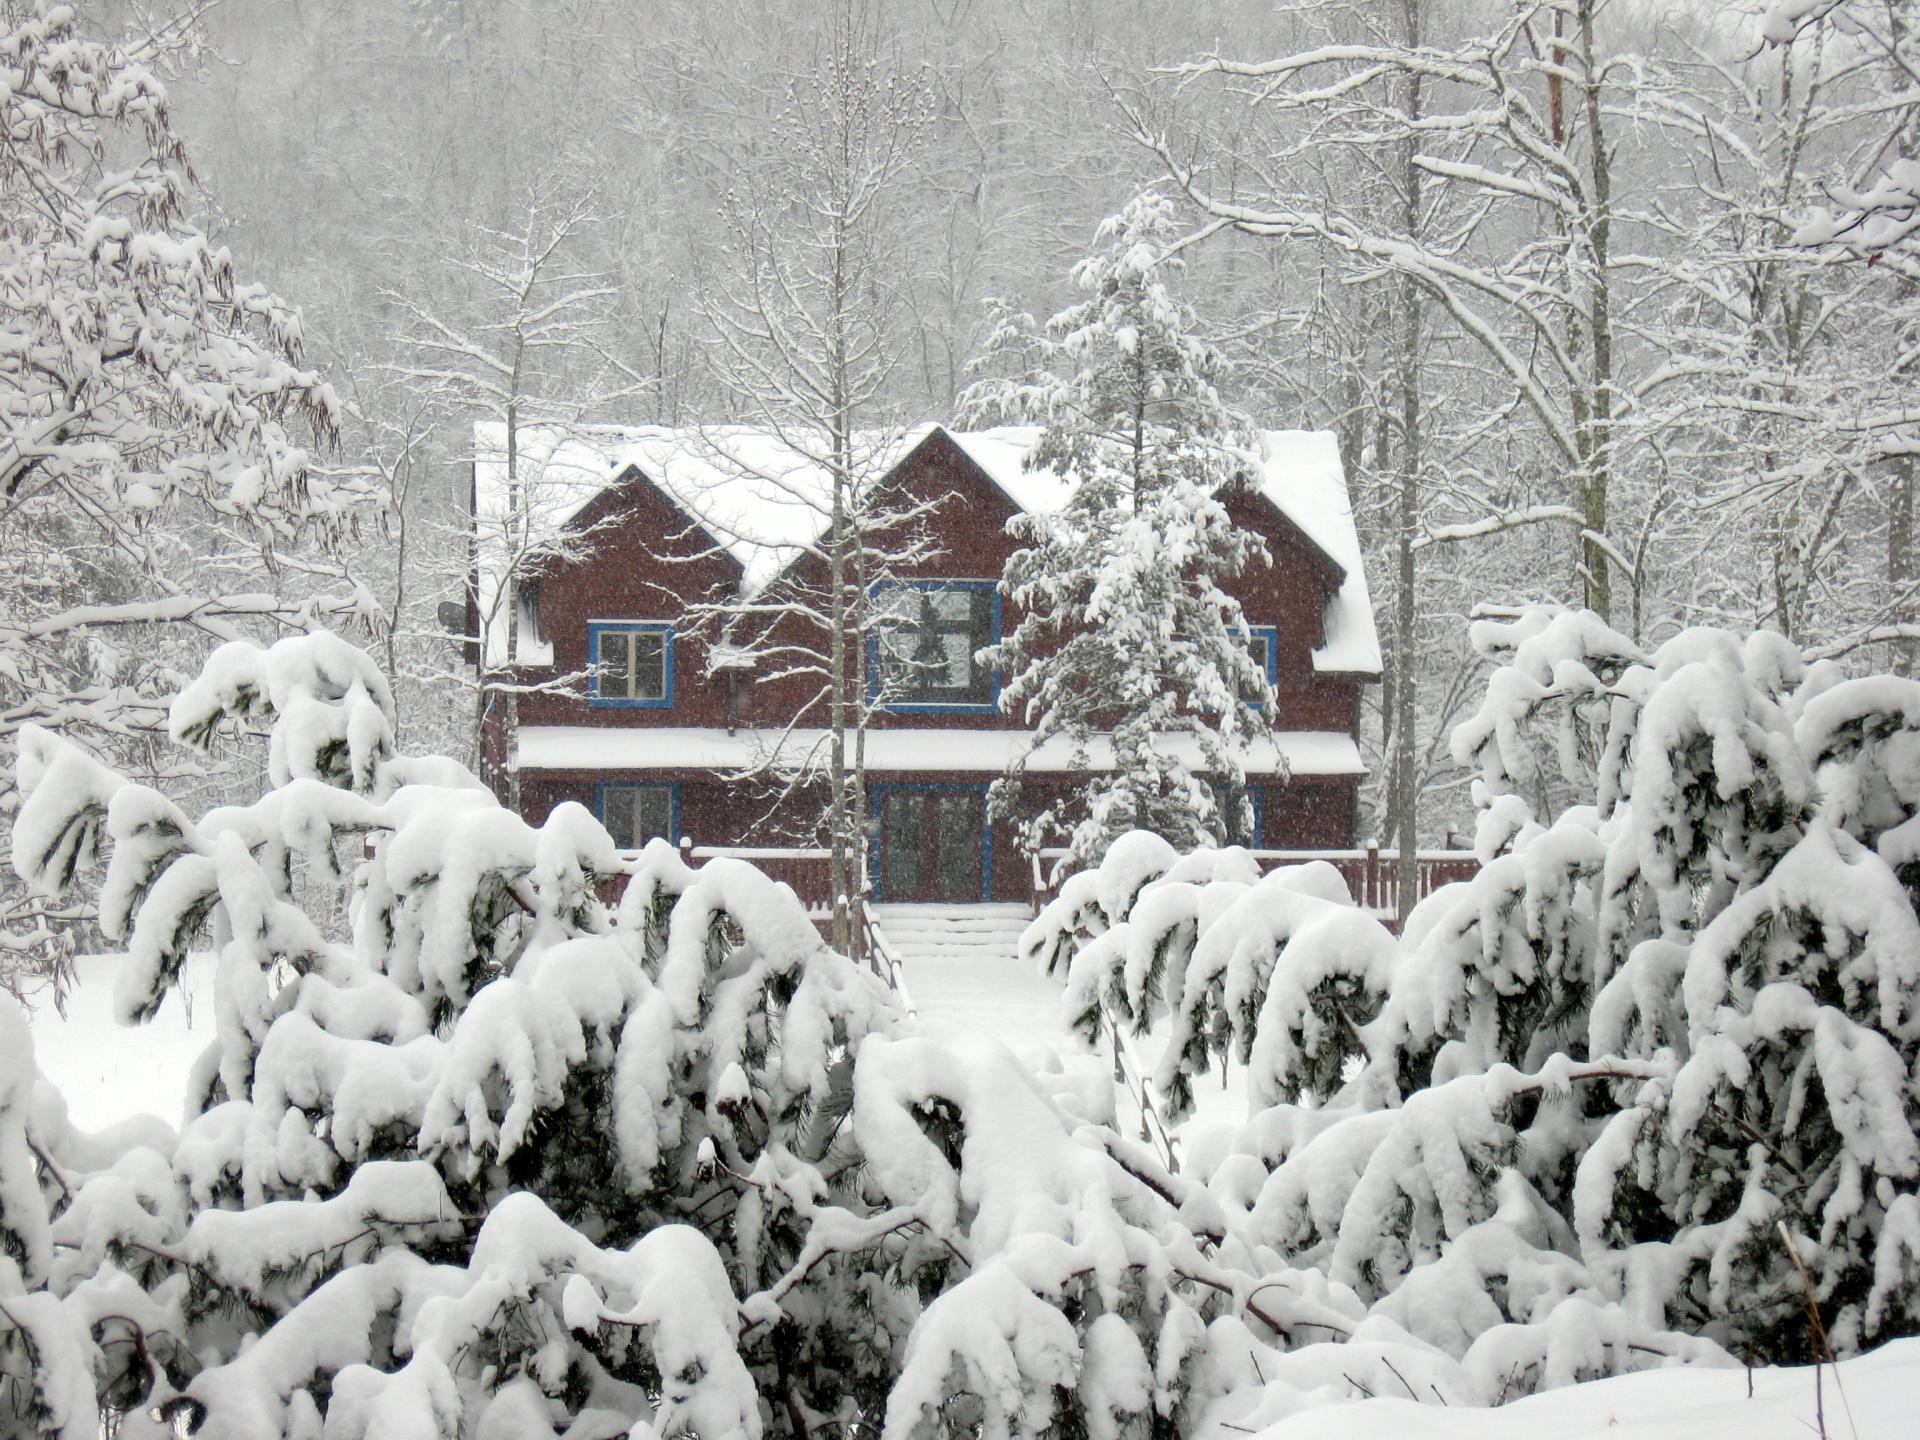 Blue Mountain Lodge Gatlinburg - Snowy Christmas in the Smokies